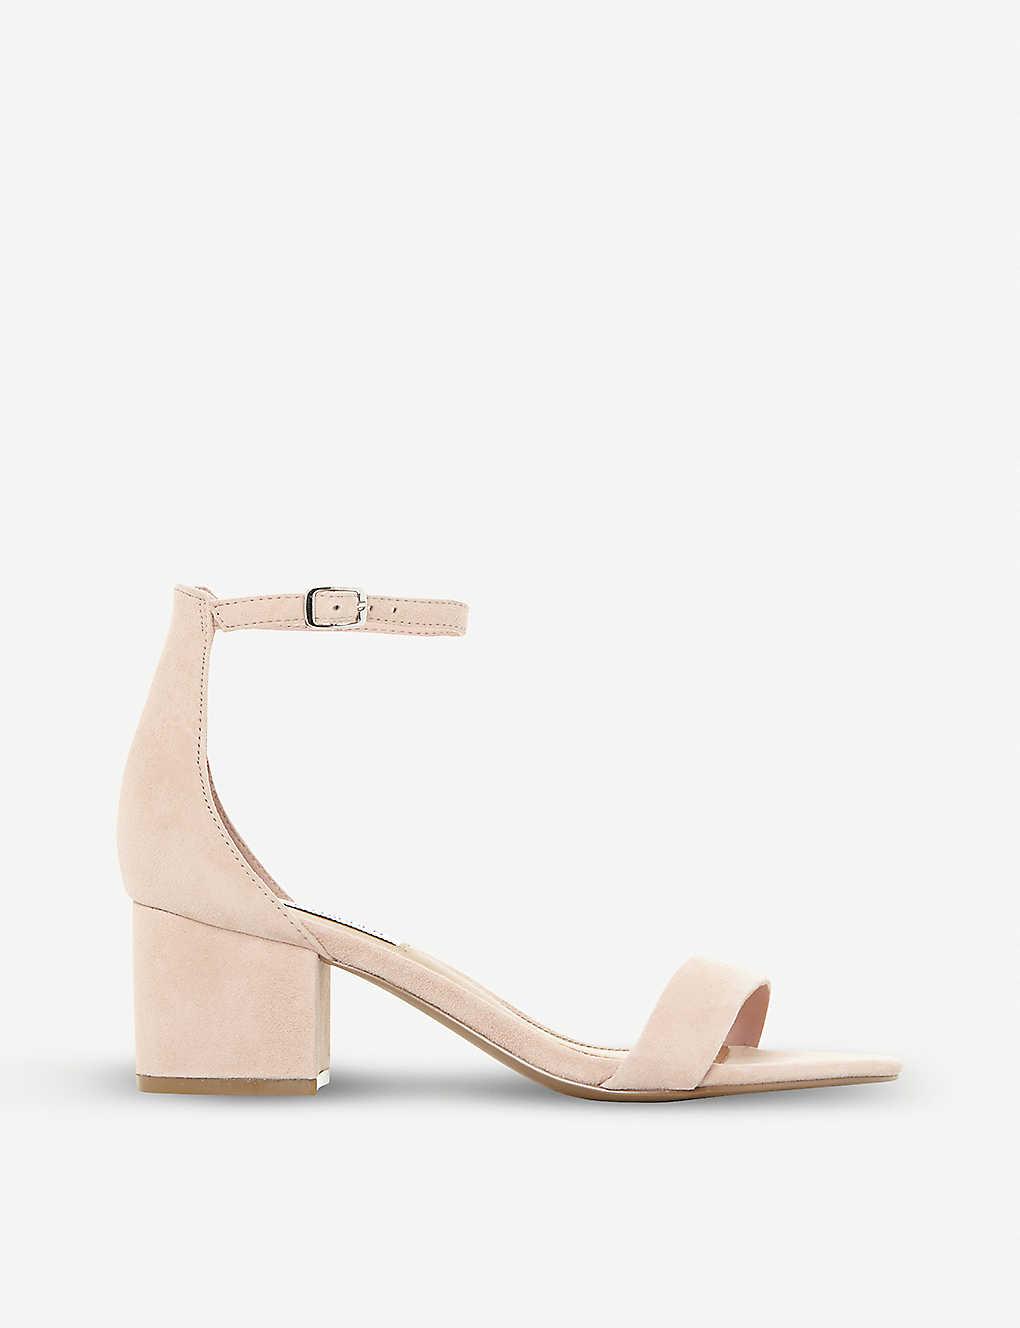 bdad1449852 STEVE MADDEN - Irenee suede heeled sandals